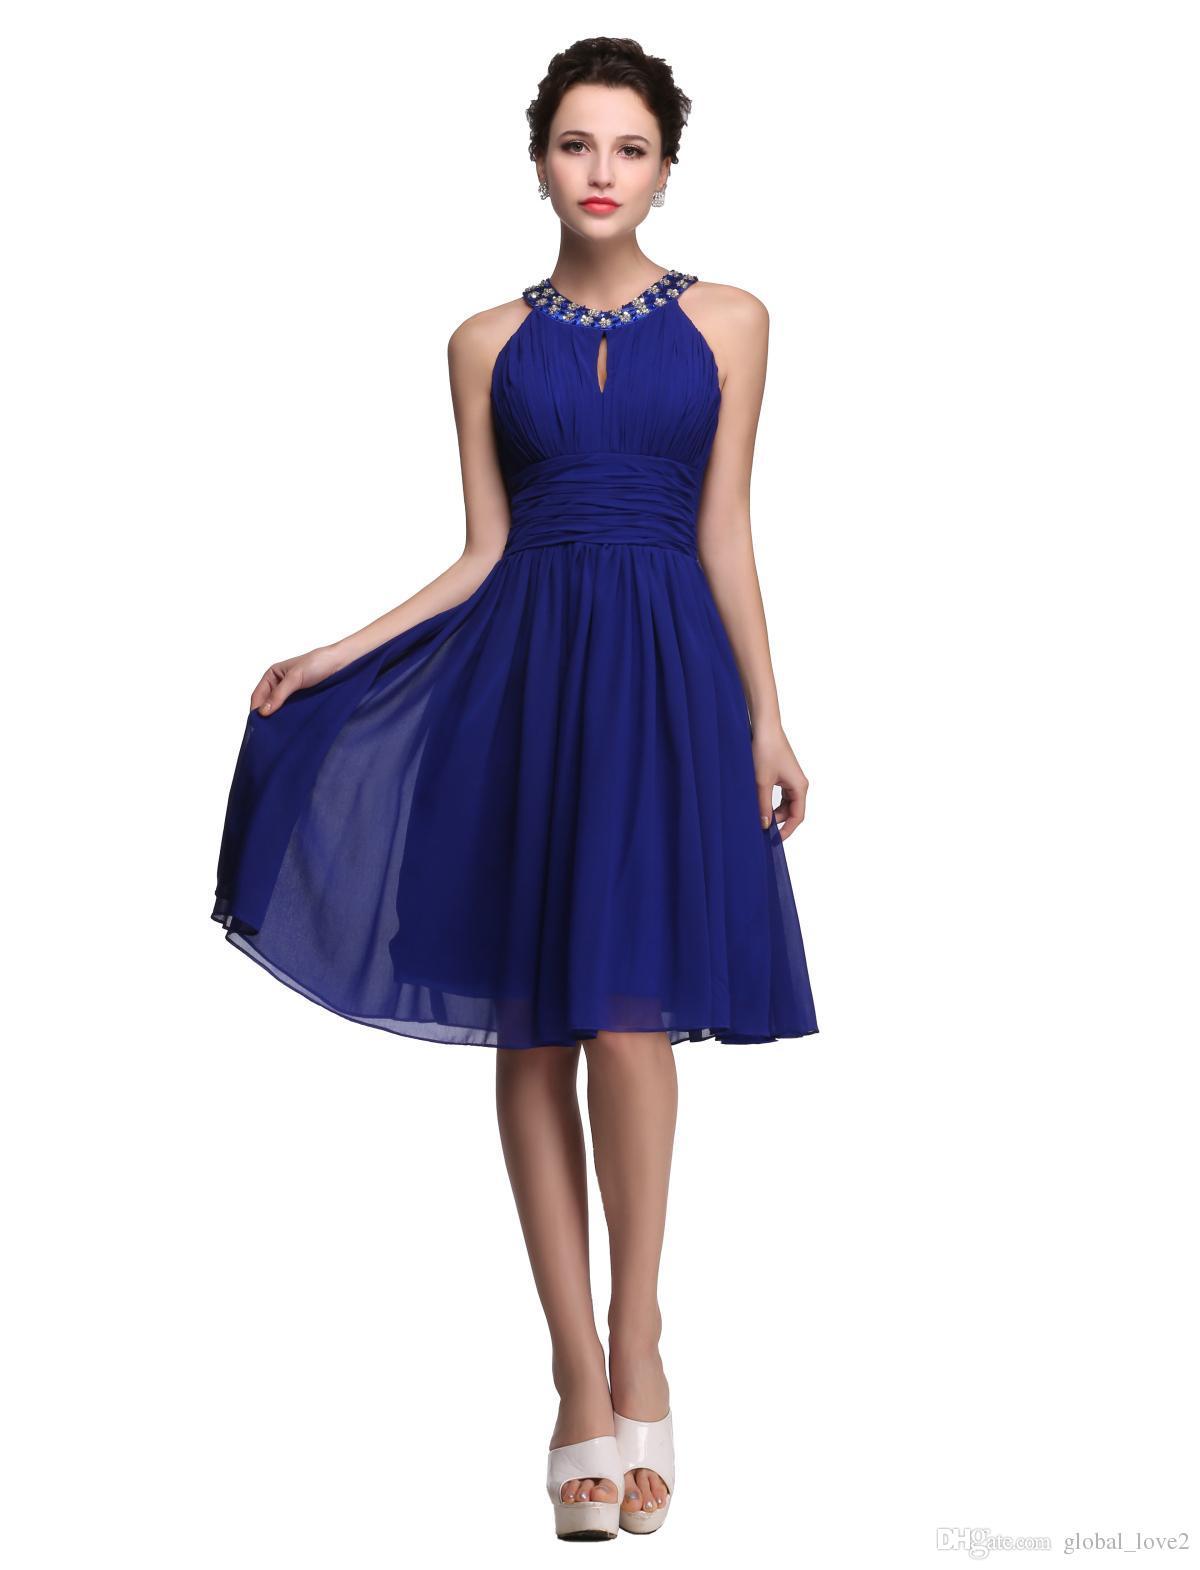 2017 New Royal Blue Prom Dresses Girls Party Dresses Knee Length ...